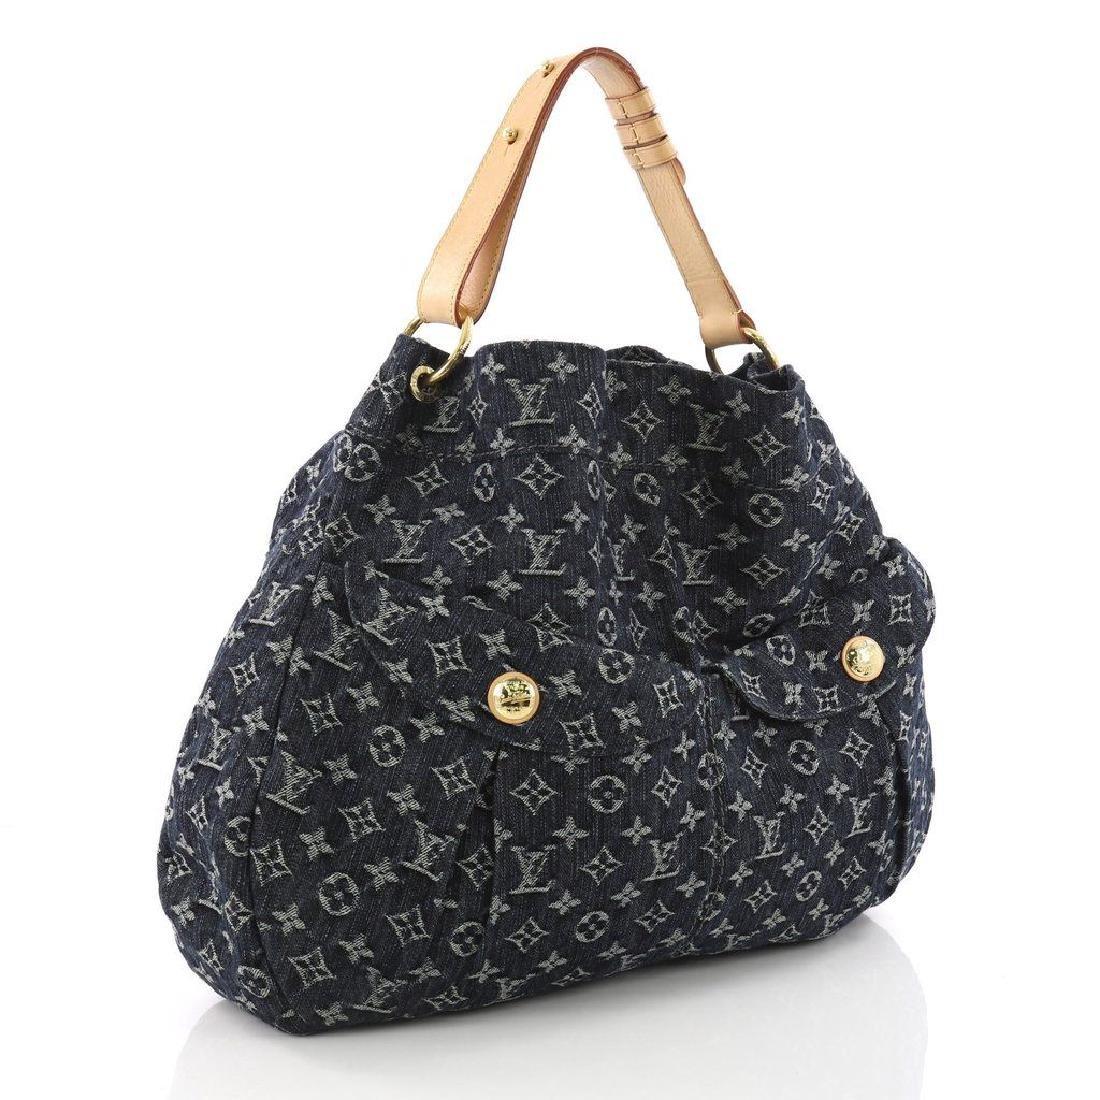 Louis Vuitton Daily Gm Jean Gris Bleu Denim Hobo Bag - 3